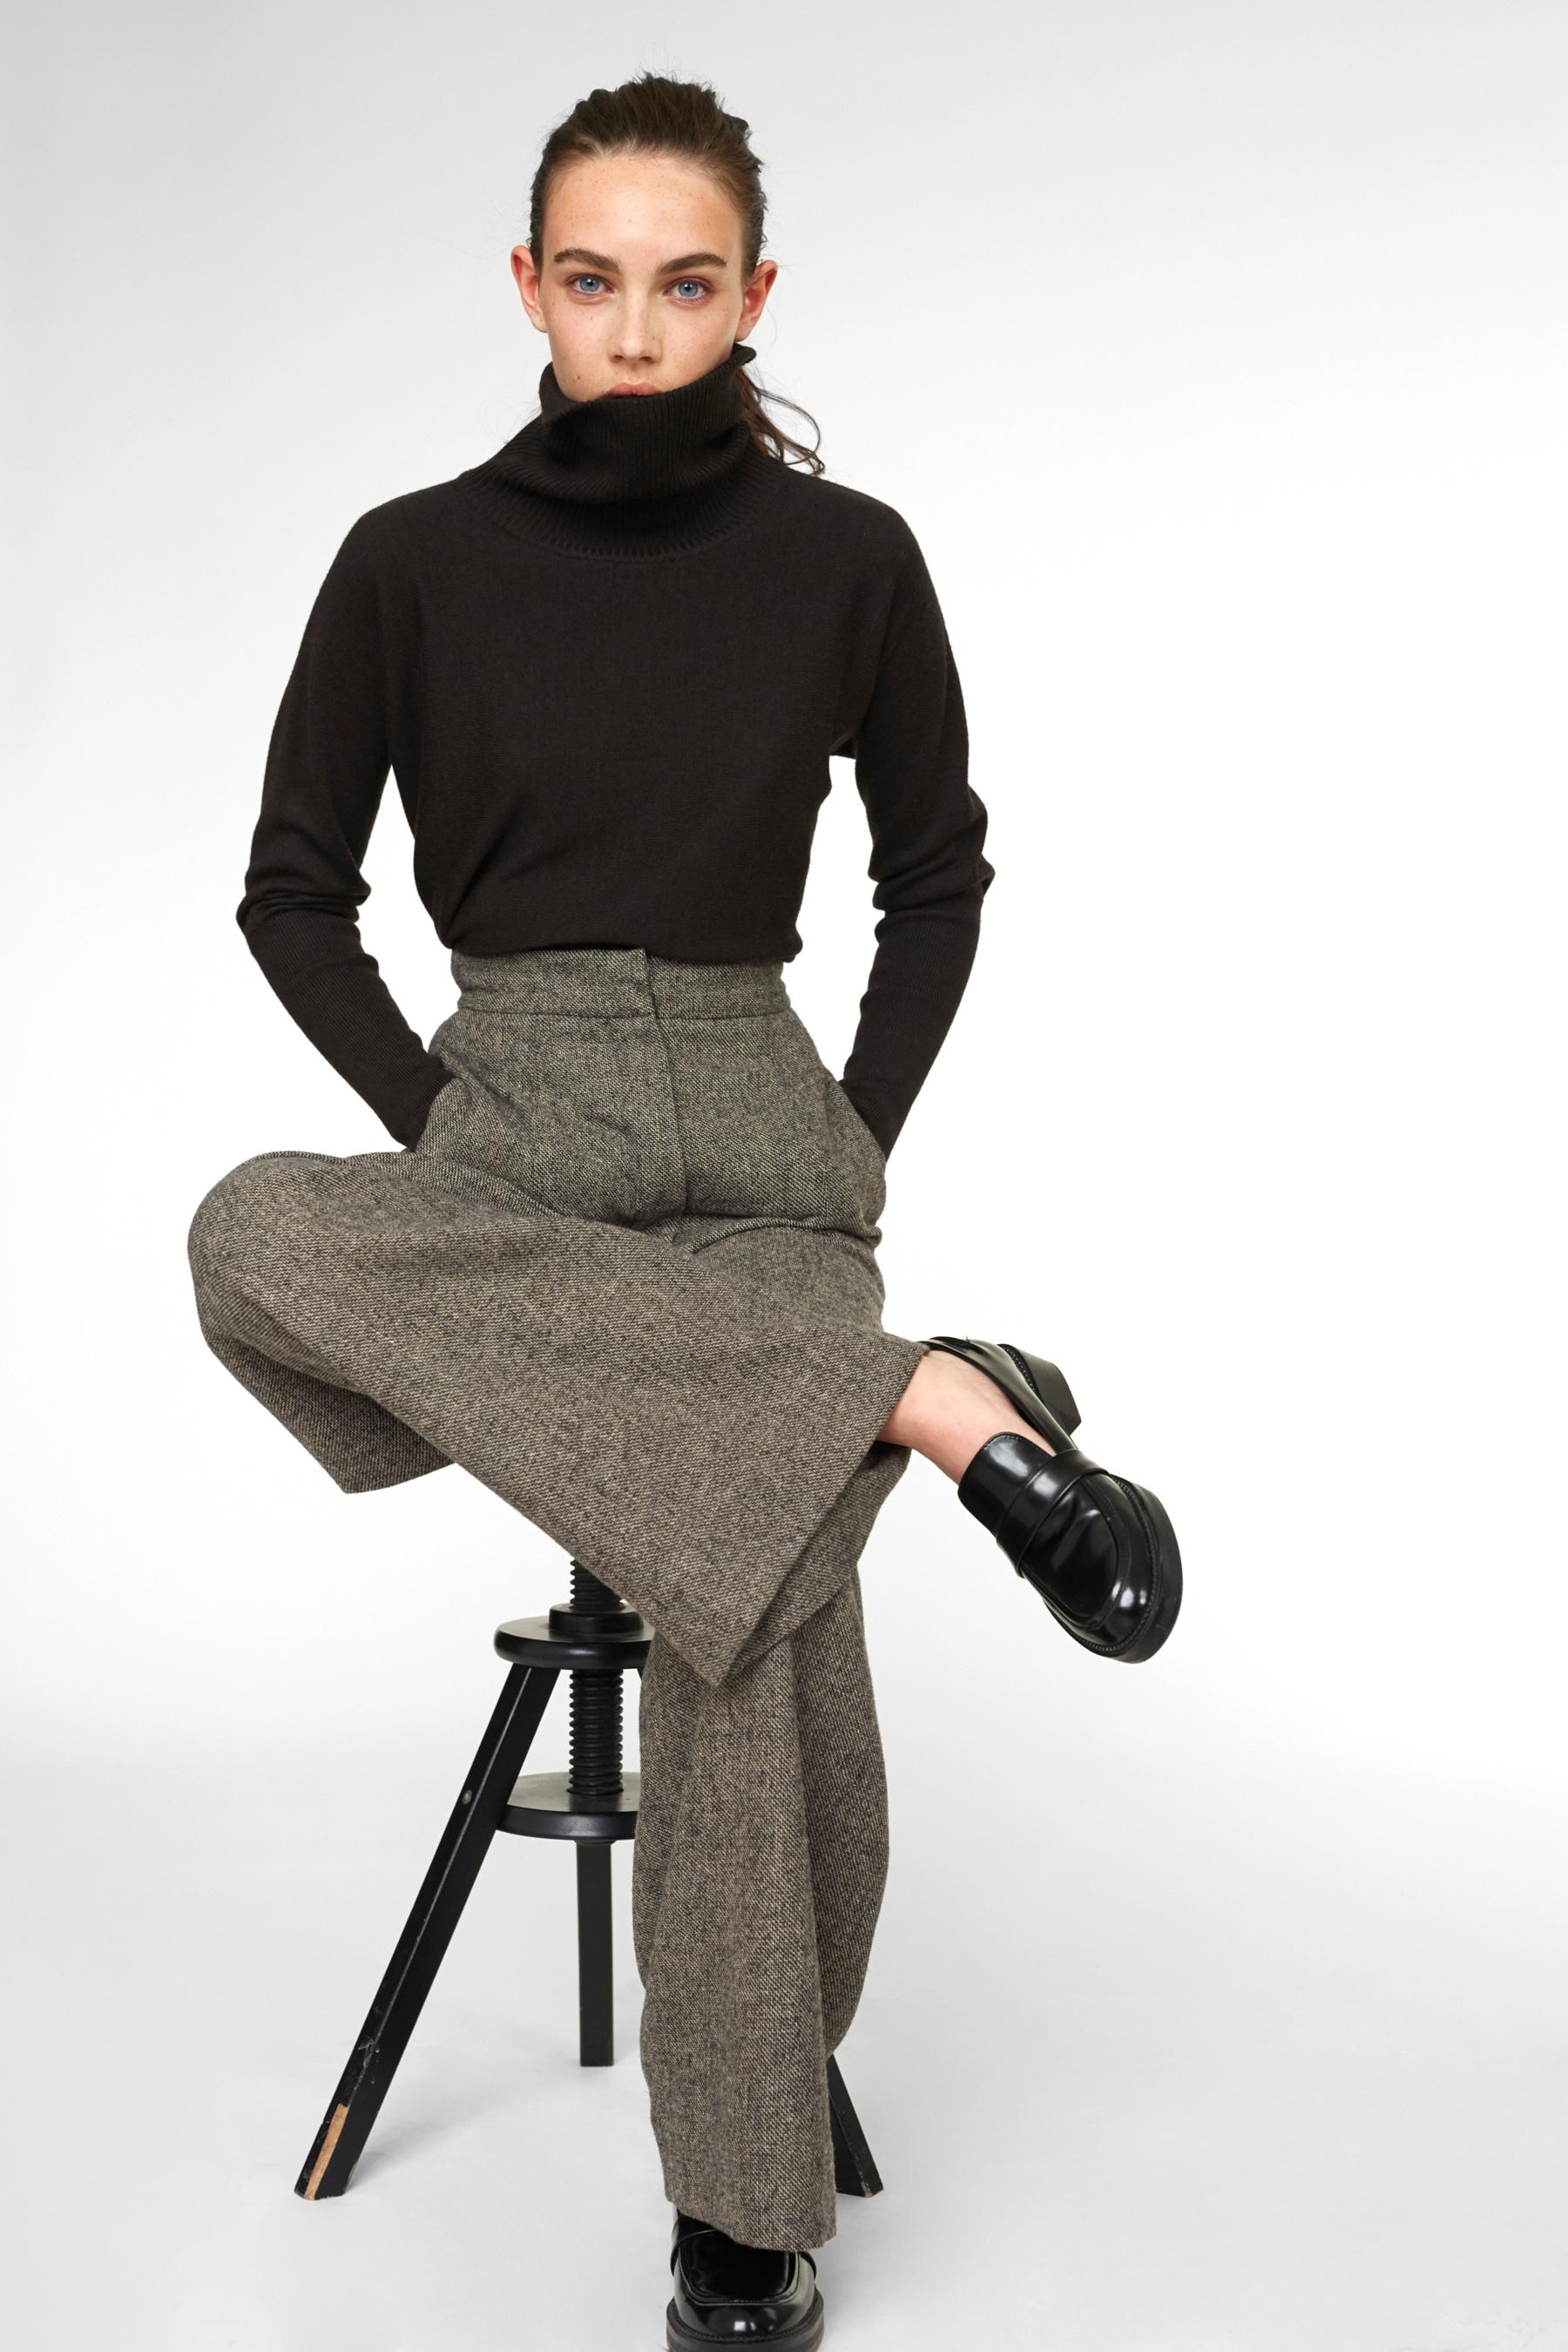 Cathrine Hammel - Artist Wife Pants - 1076